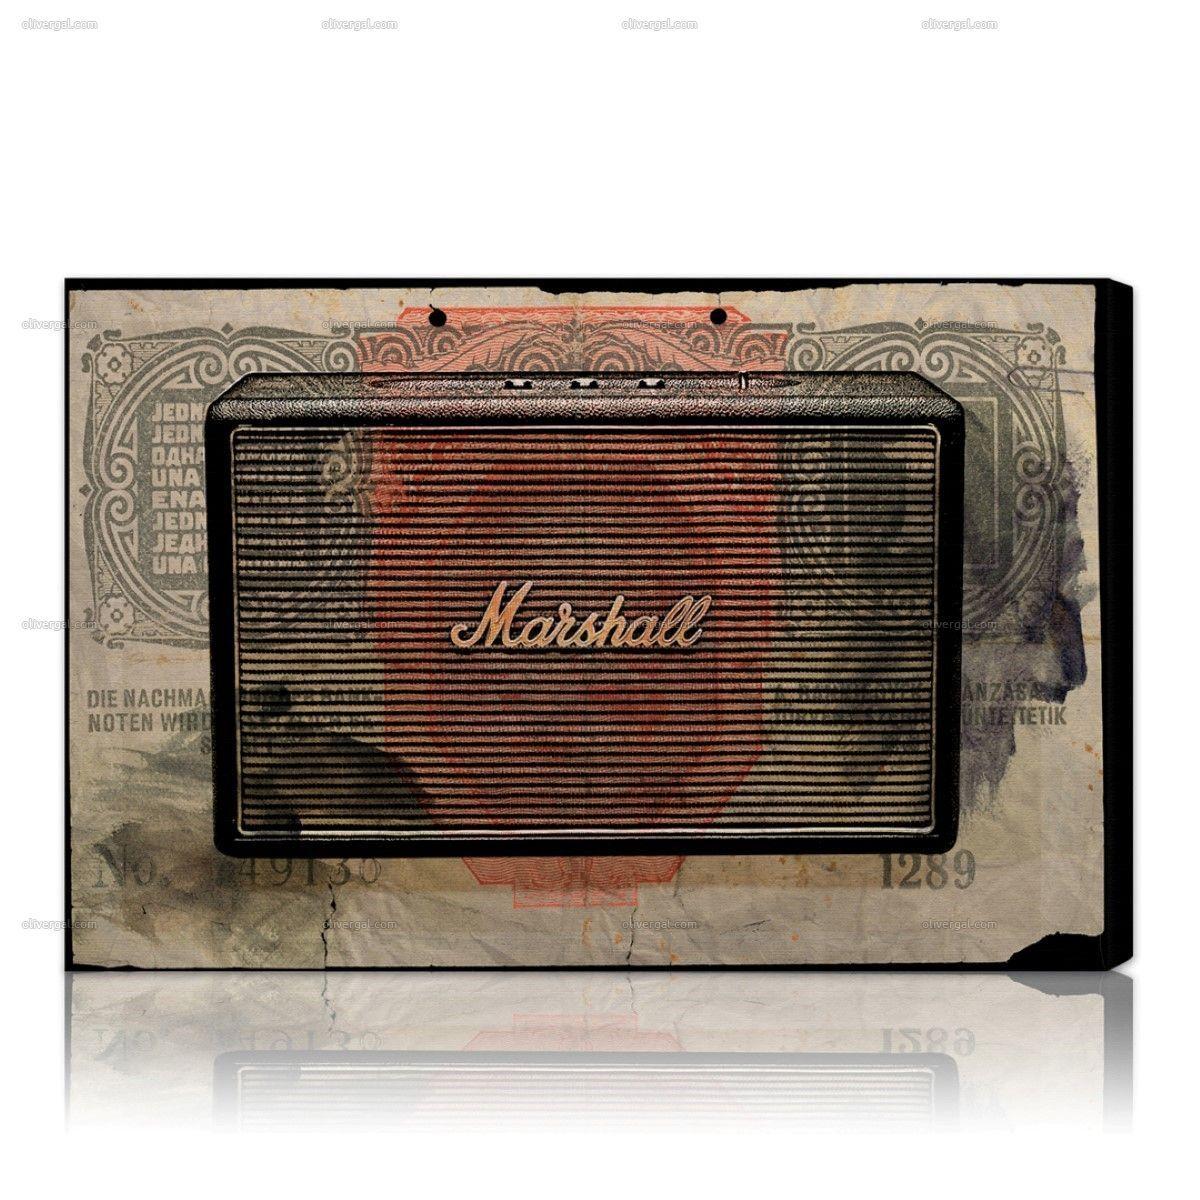 Marshall Audio wall art artwork décor trends london